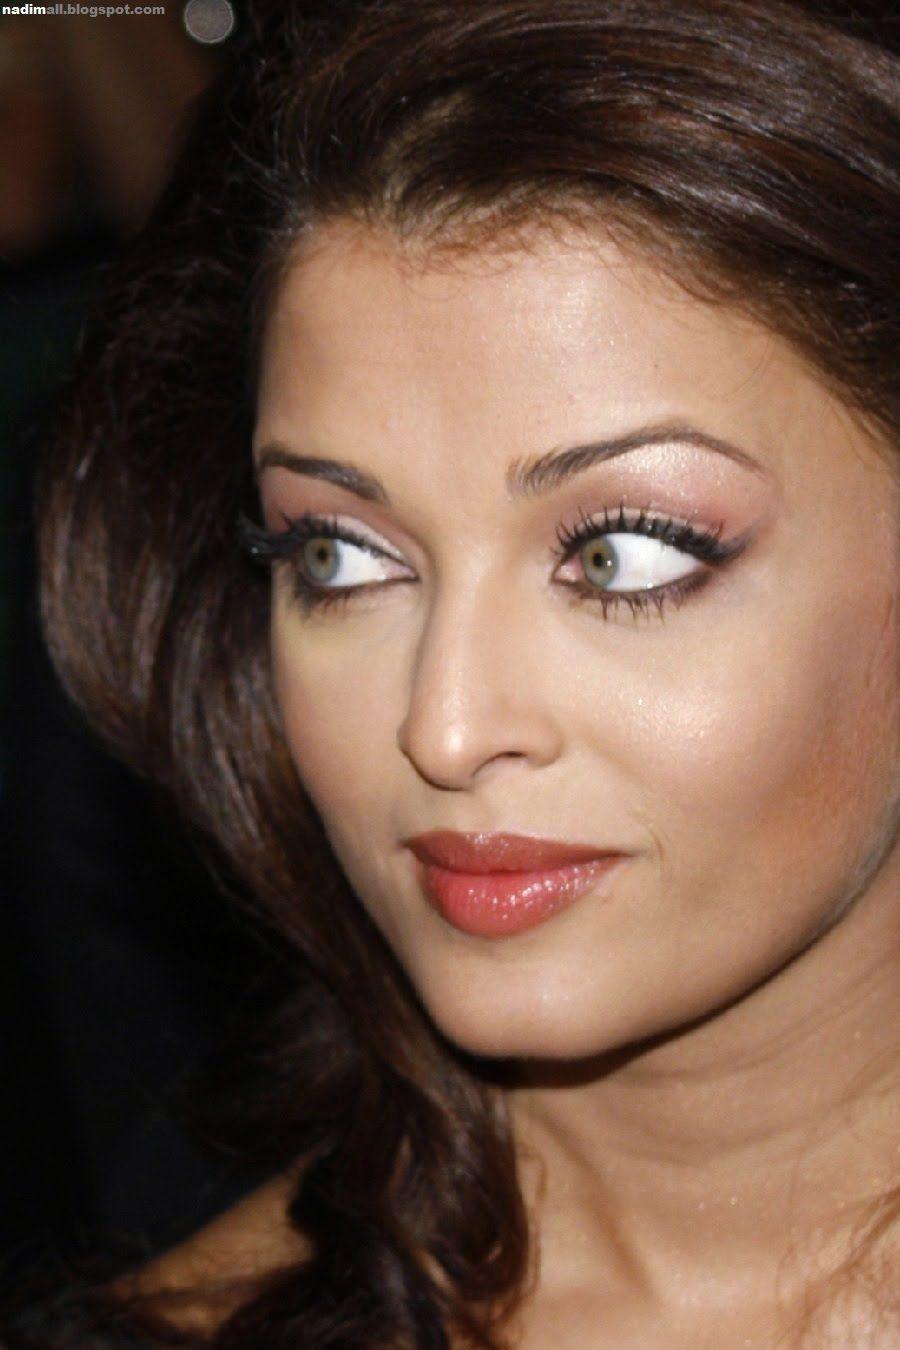 aishwarya rai 2009 may to december   actress aishwarya rai